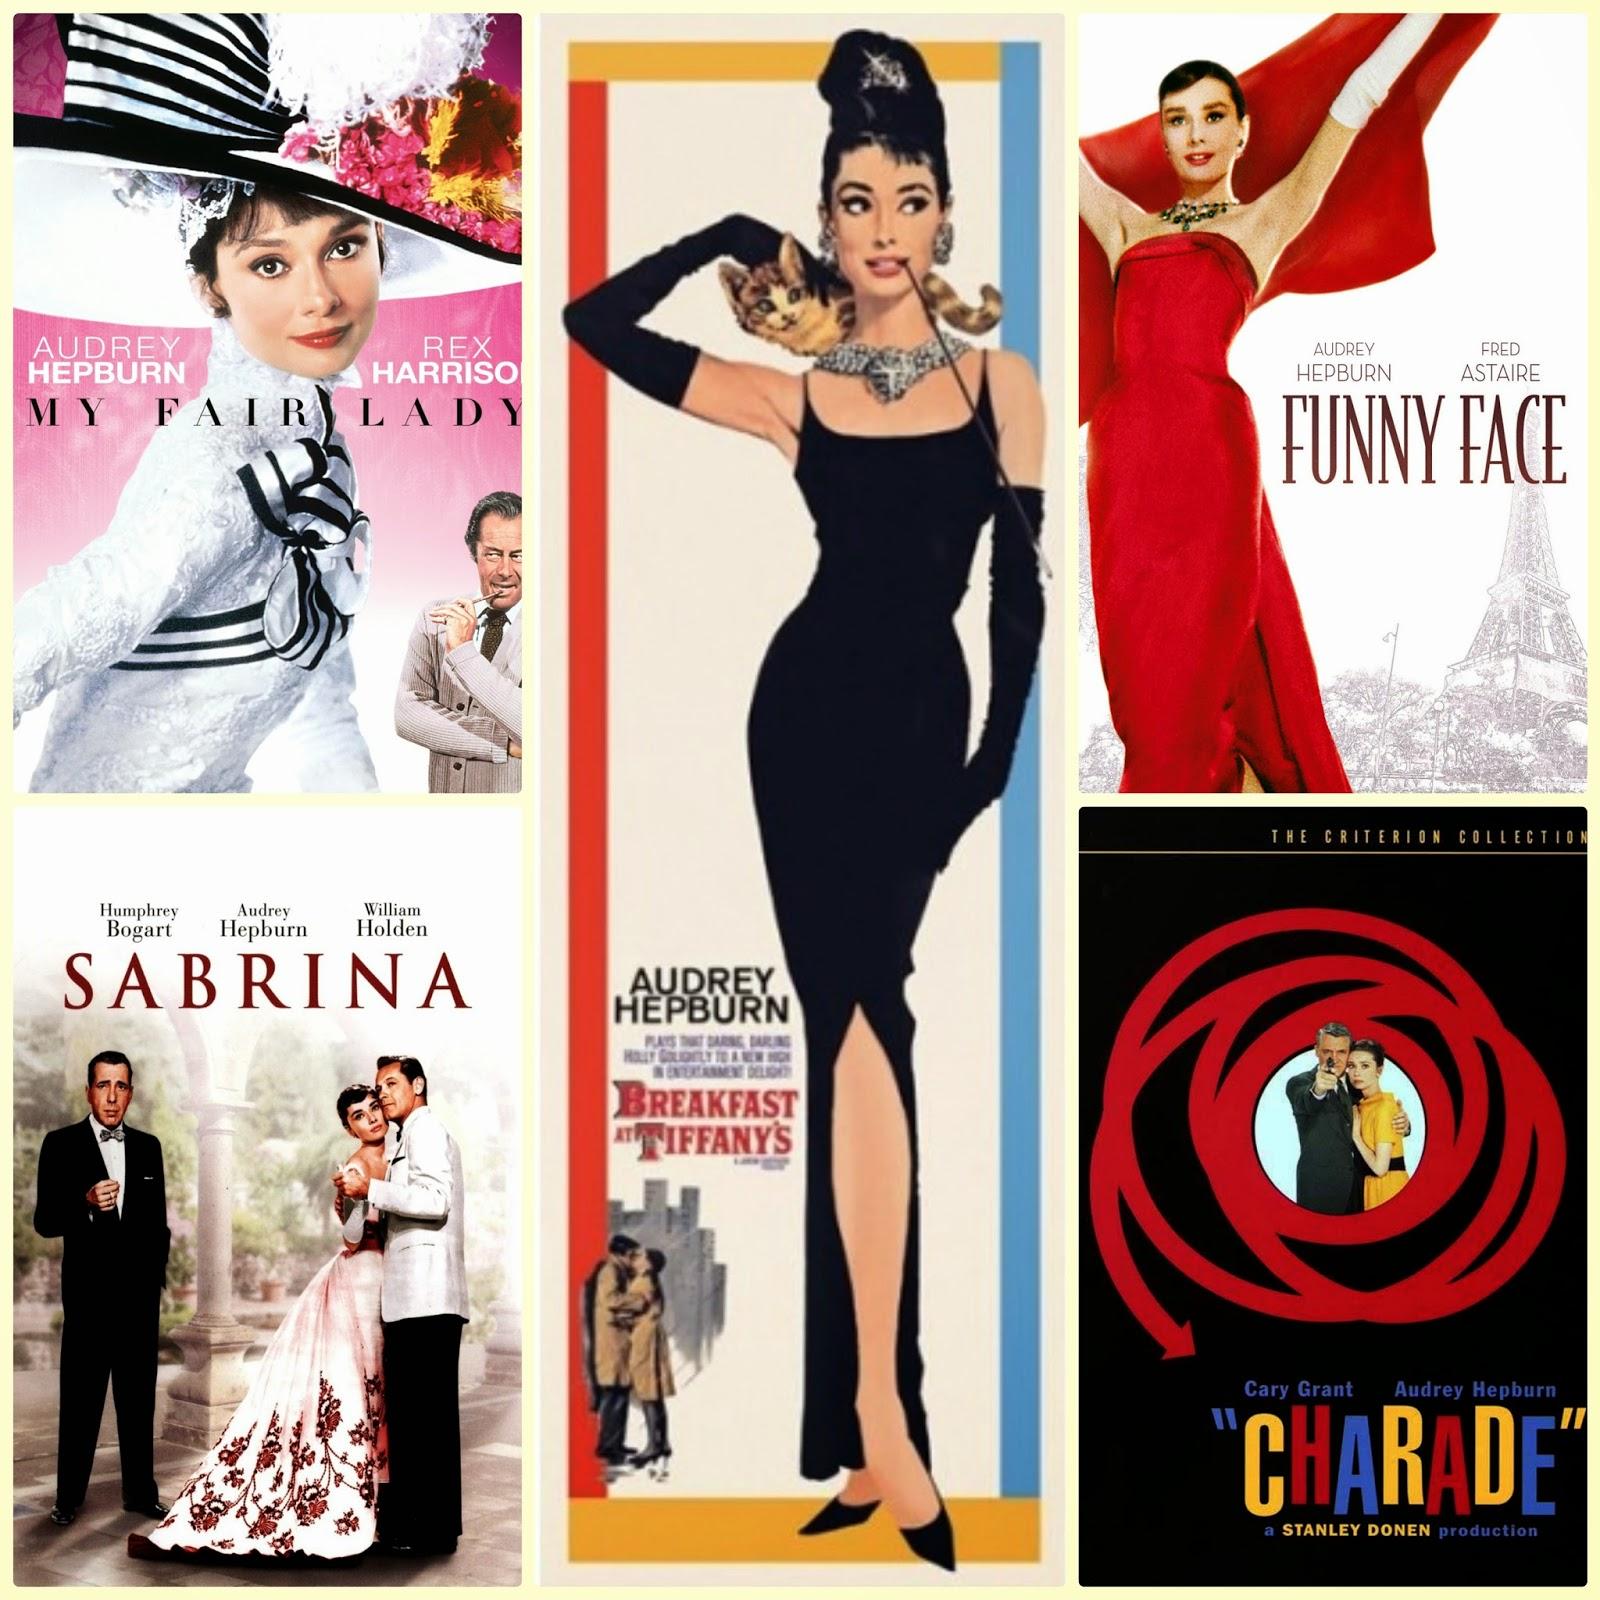 Favorite Audrey Hepburn Movies